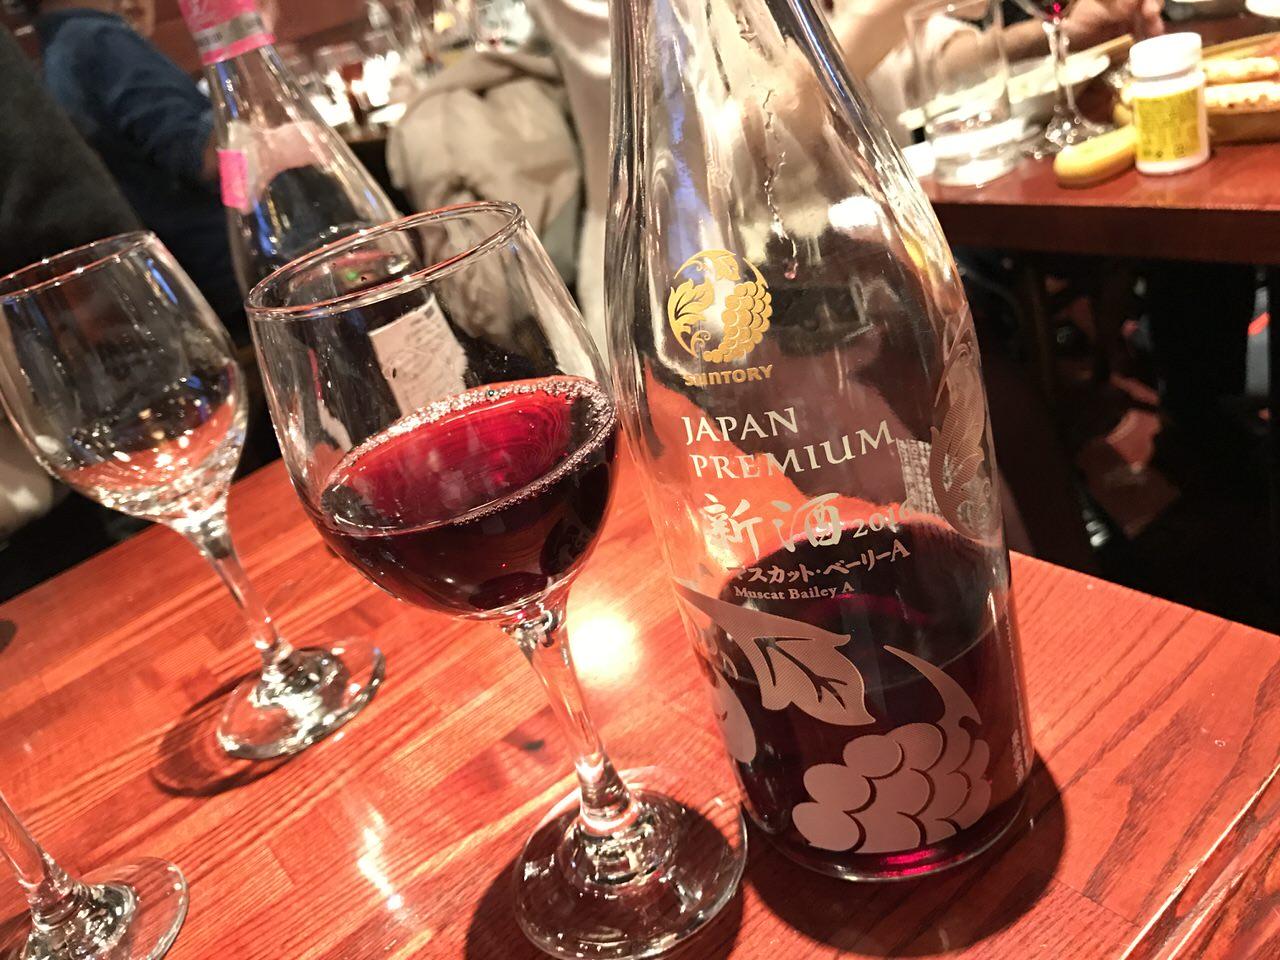 Suntory wine 1788